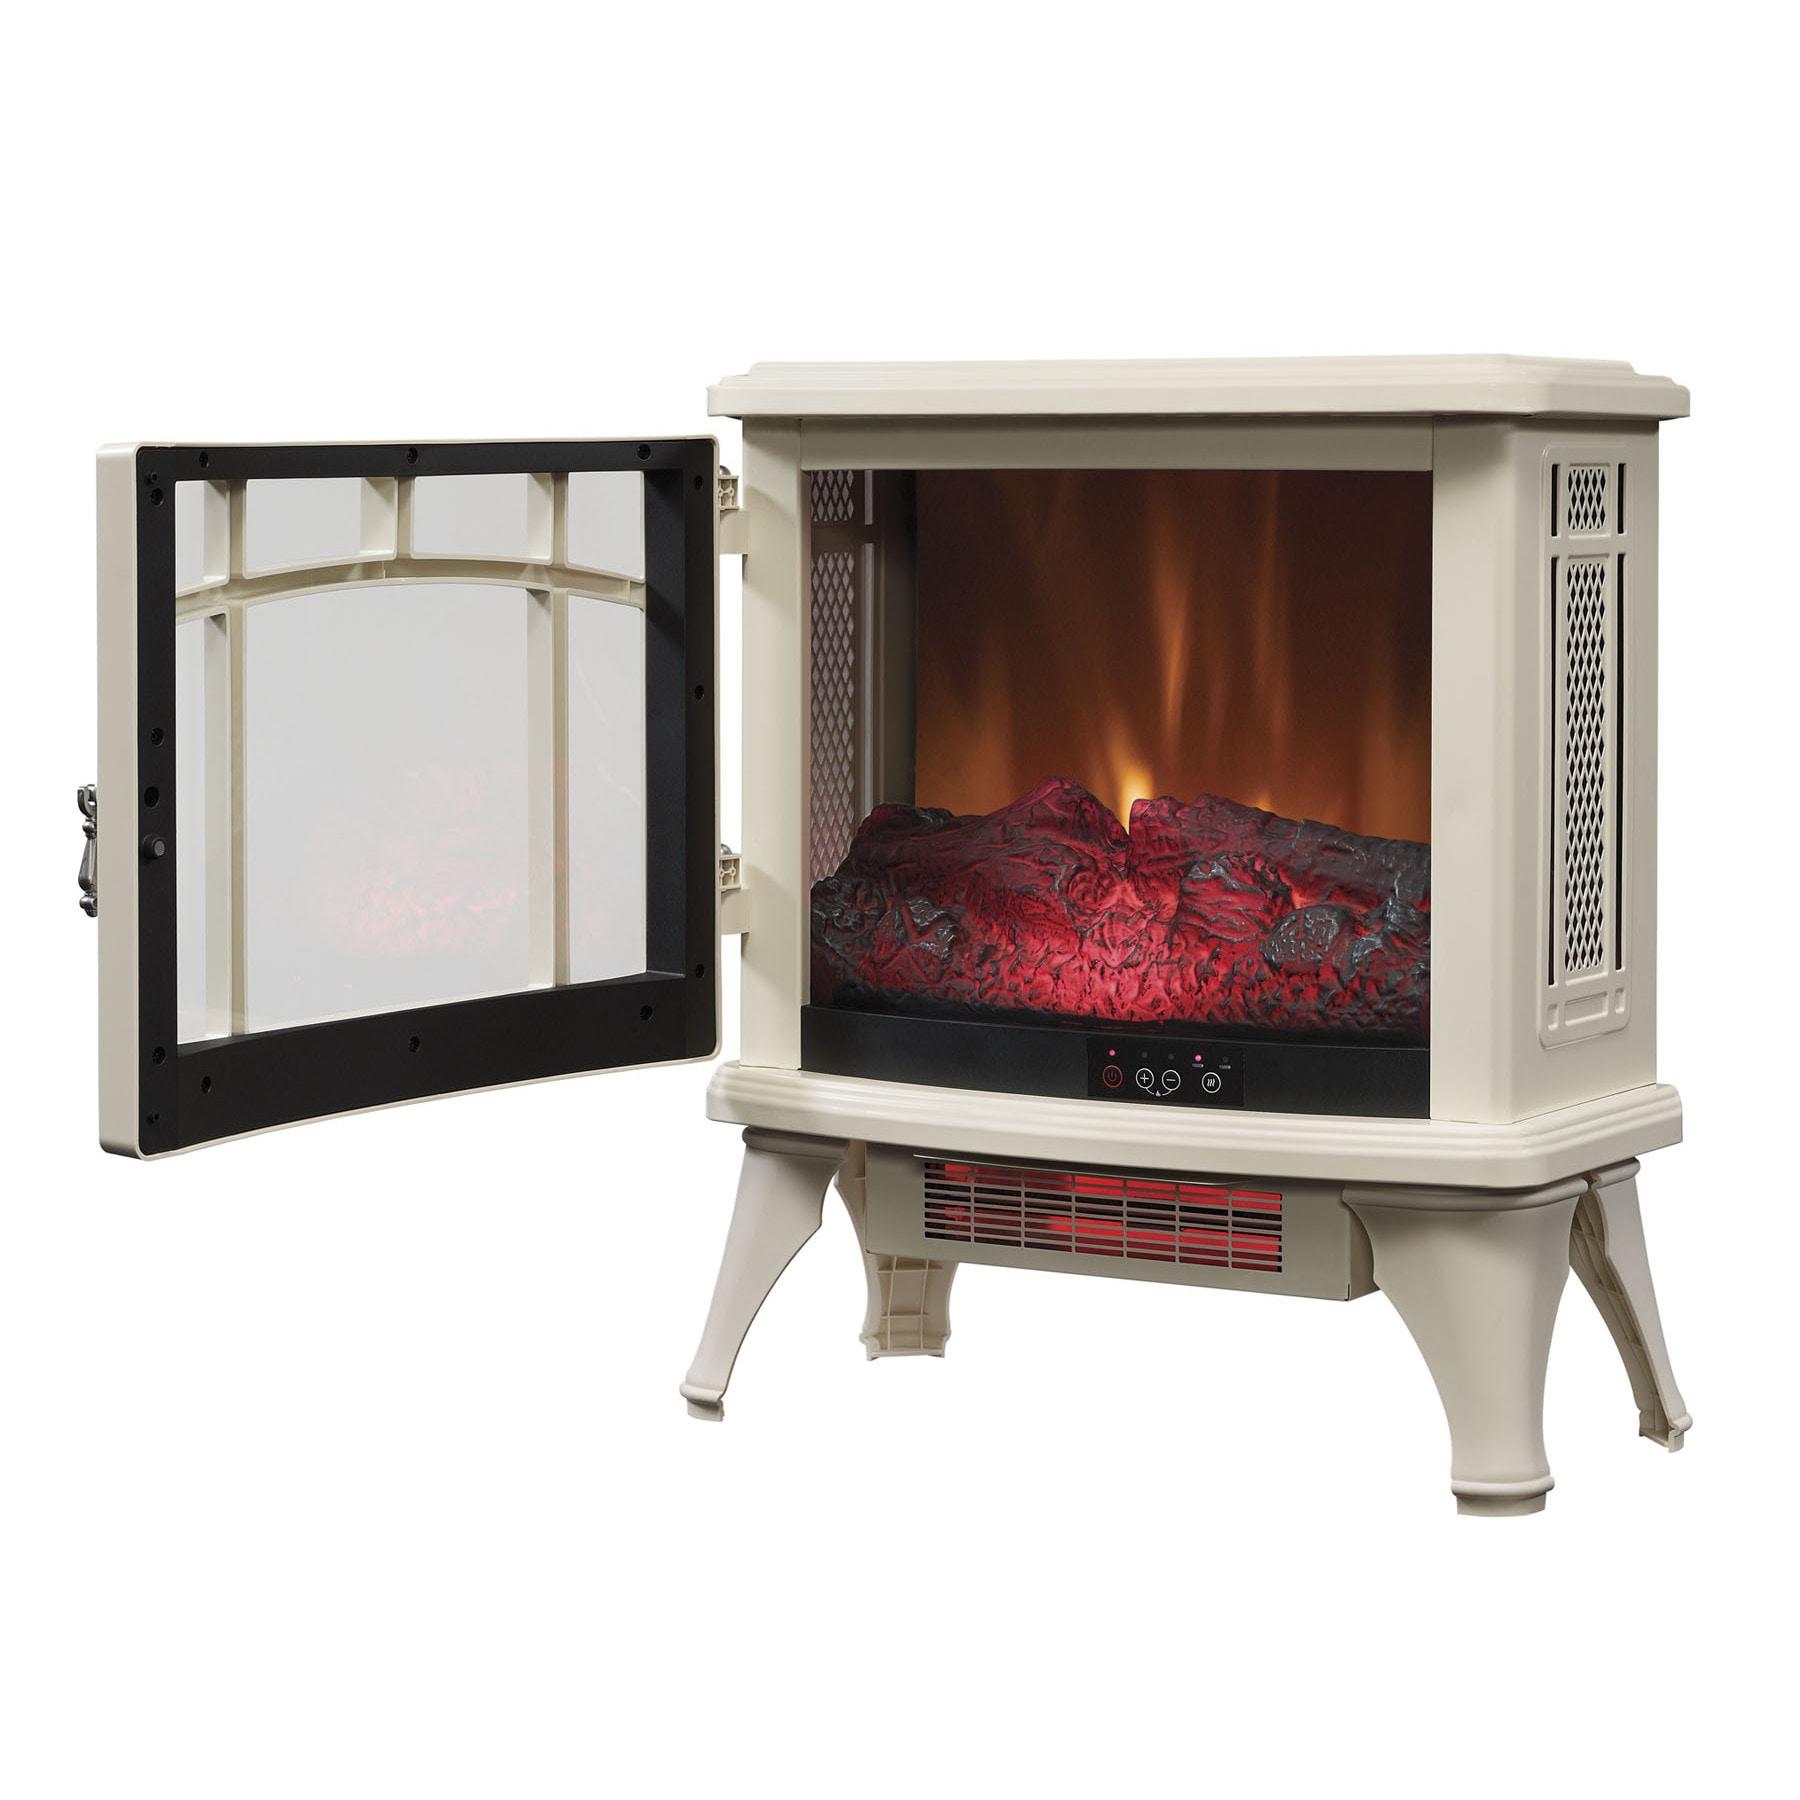 Prime Duraflame Dfi501001 Infrared Quartz Electric Fireplace Stove Interior Design Ideas Gentotryabchikinfo